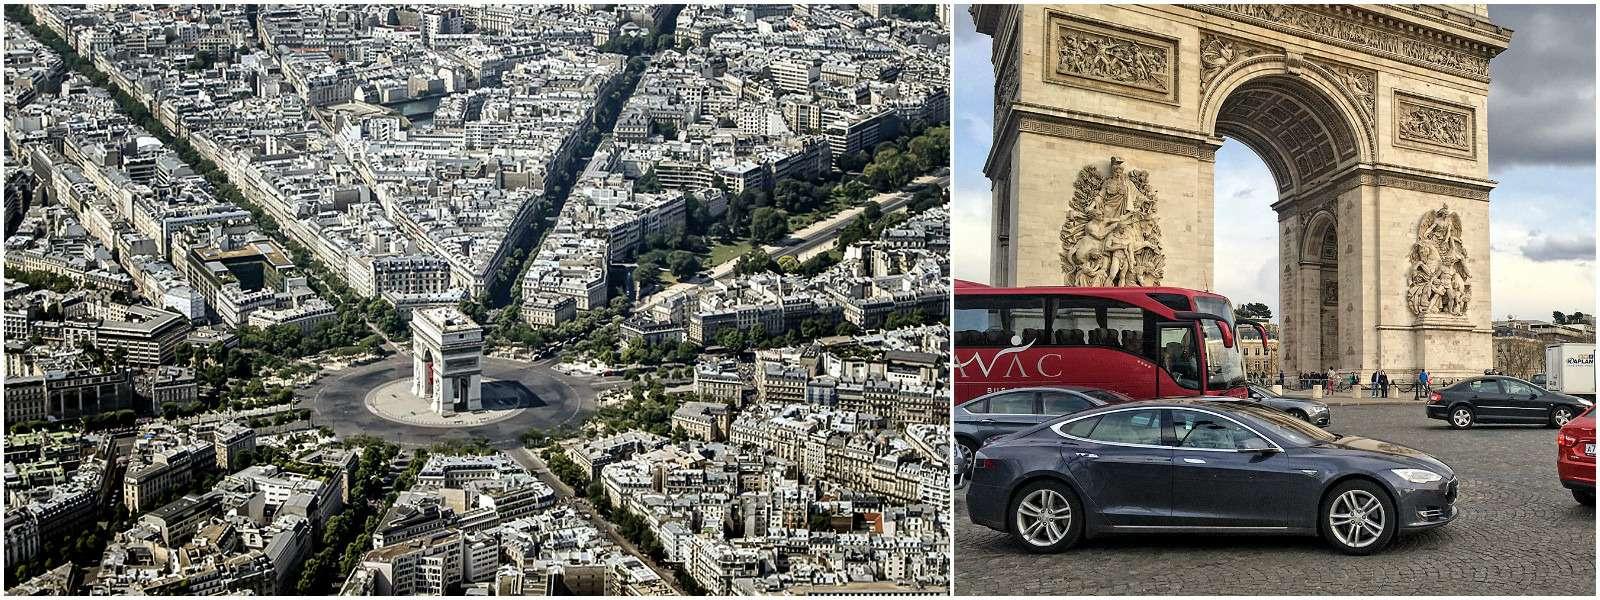 Площадь Звезды, Париж, Франция.